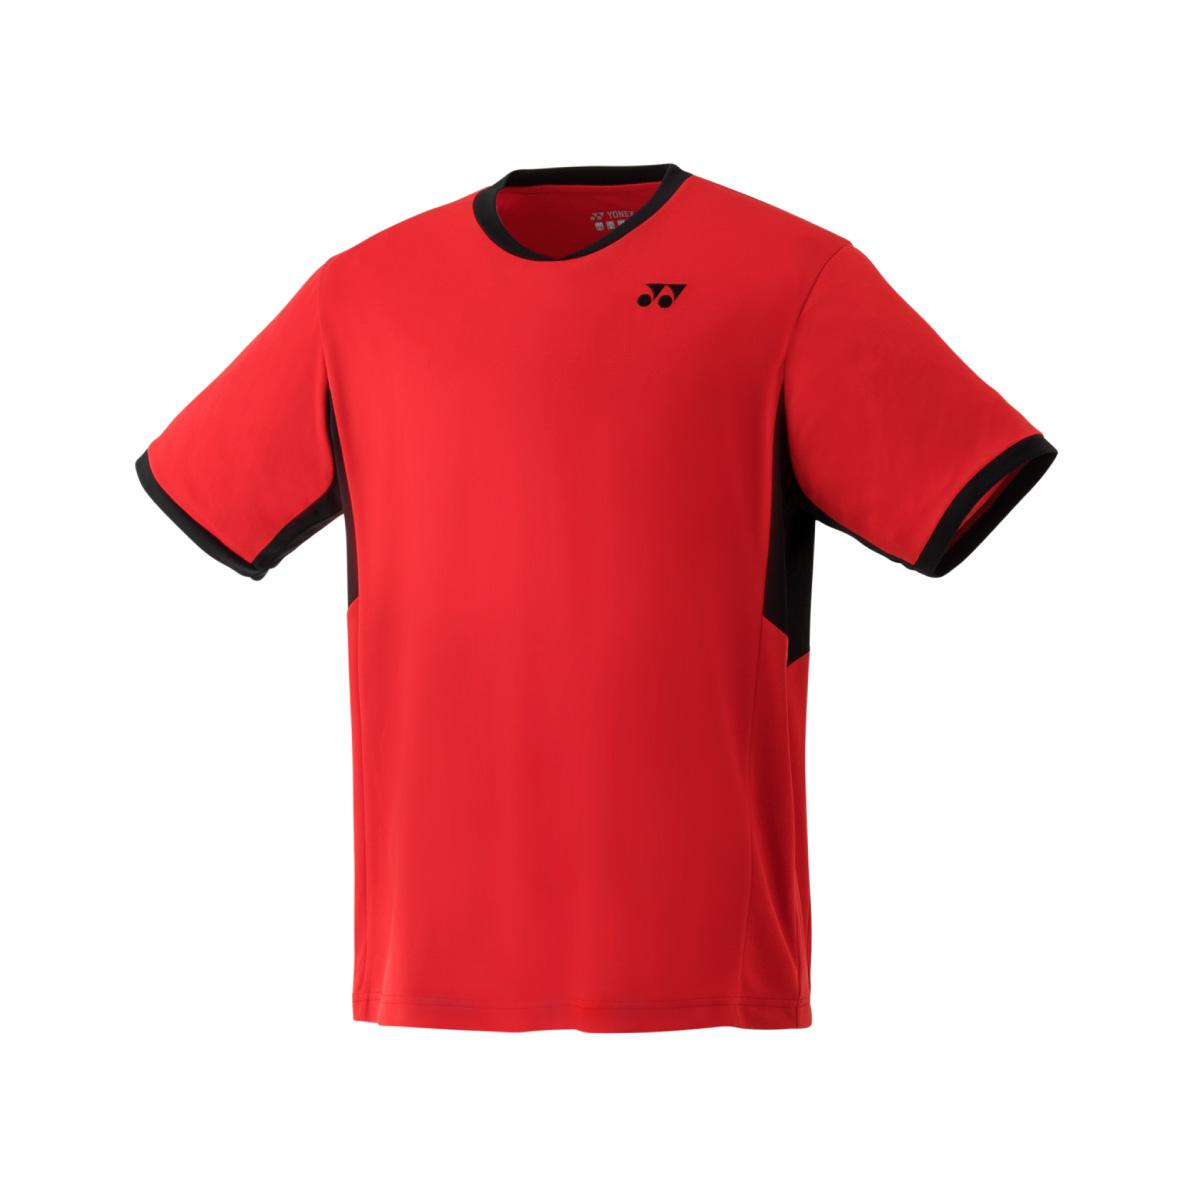 YONEX - Junior Crew Neck Shirt #YJ0010Detailbild - 1